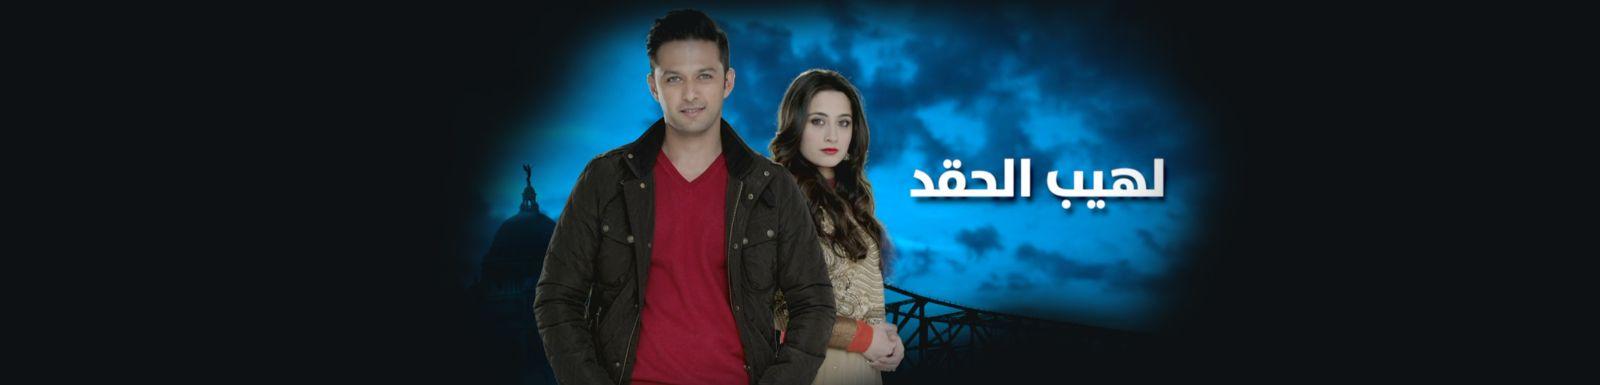 ����� ����� ���� ����� ������ 10 MBC shahid ���� ��